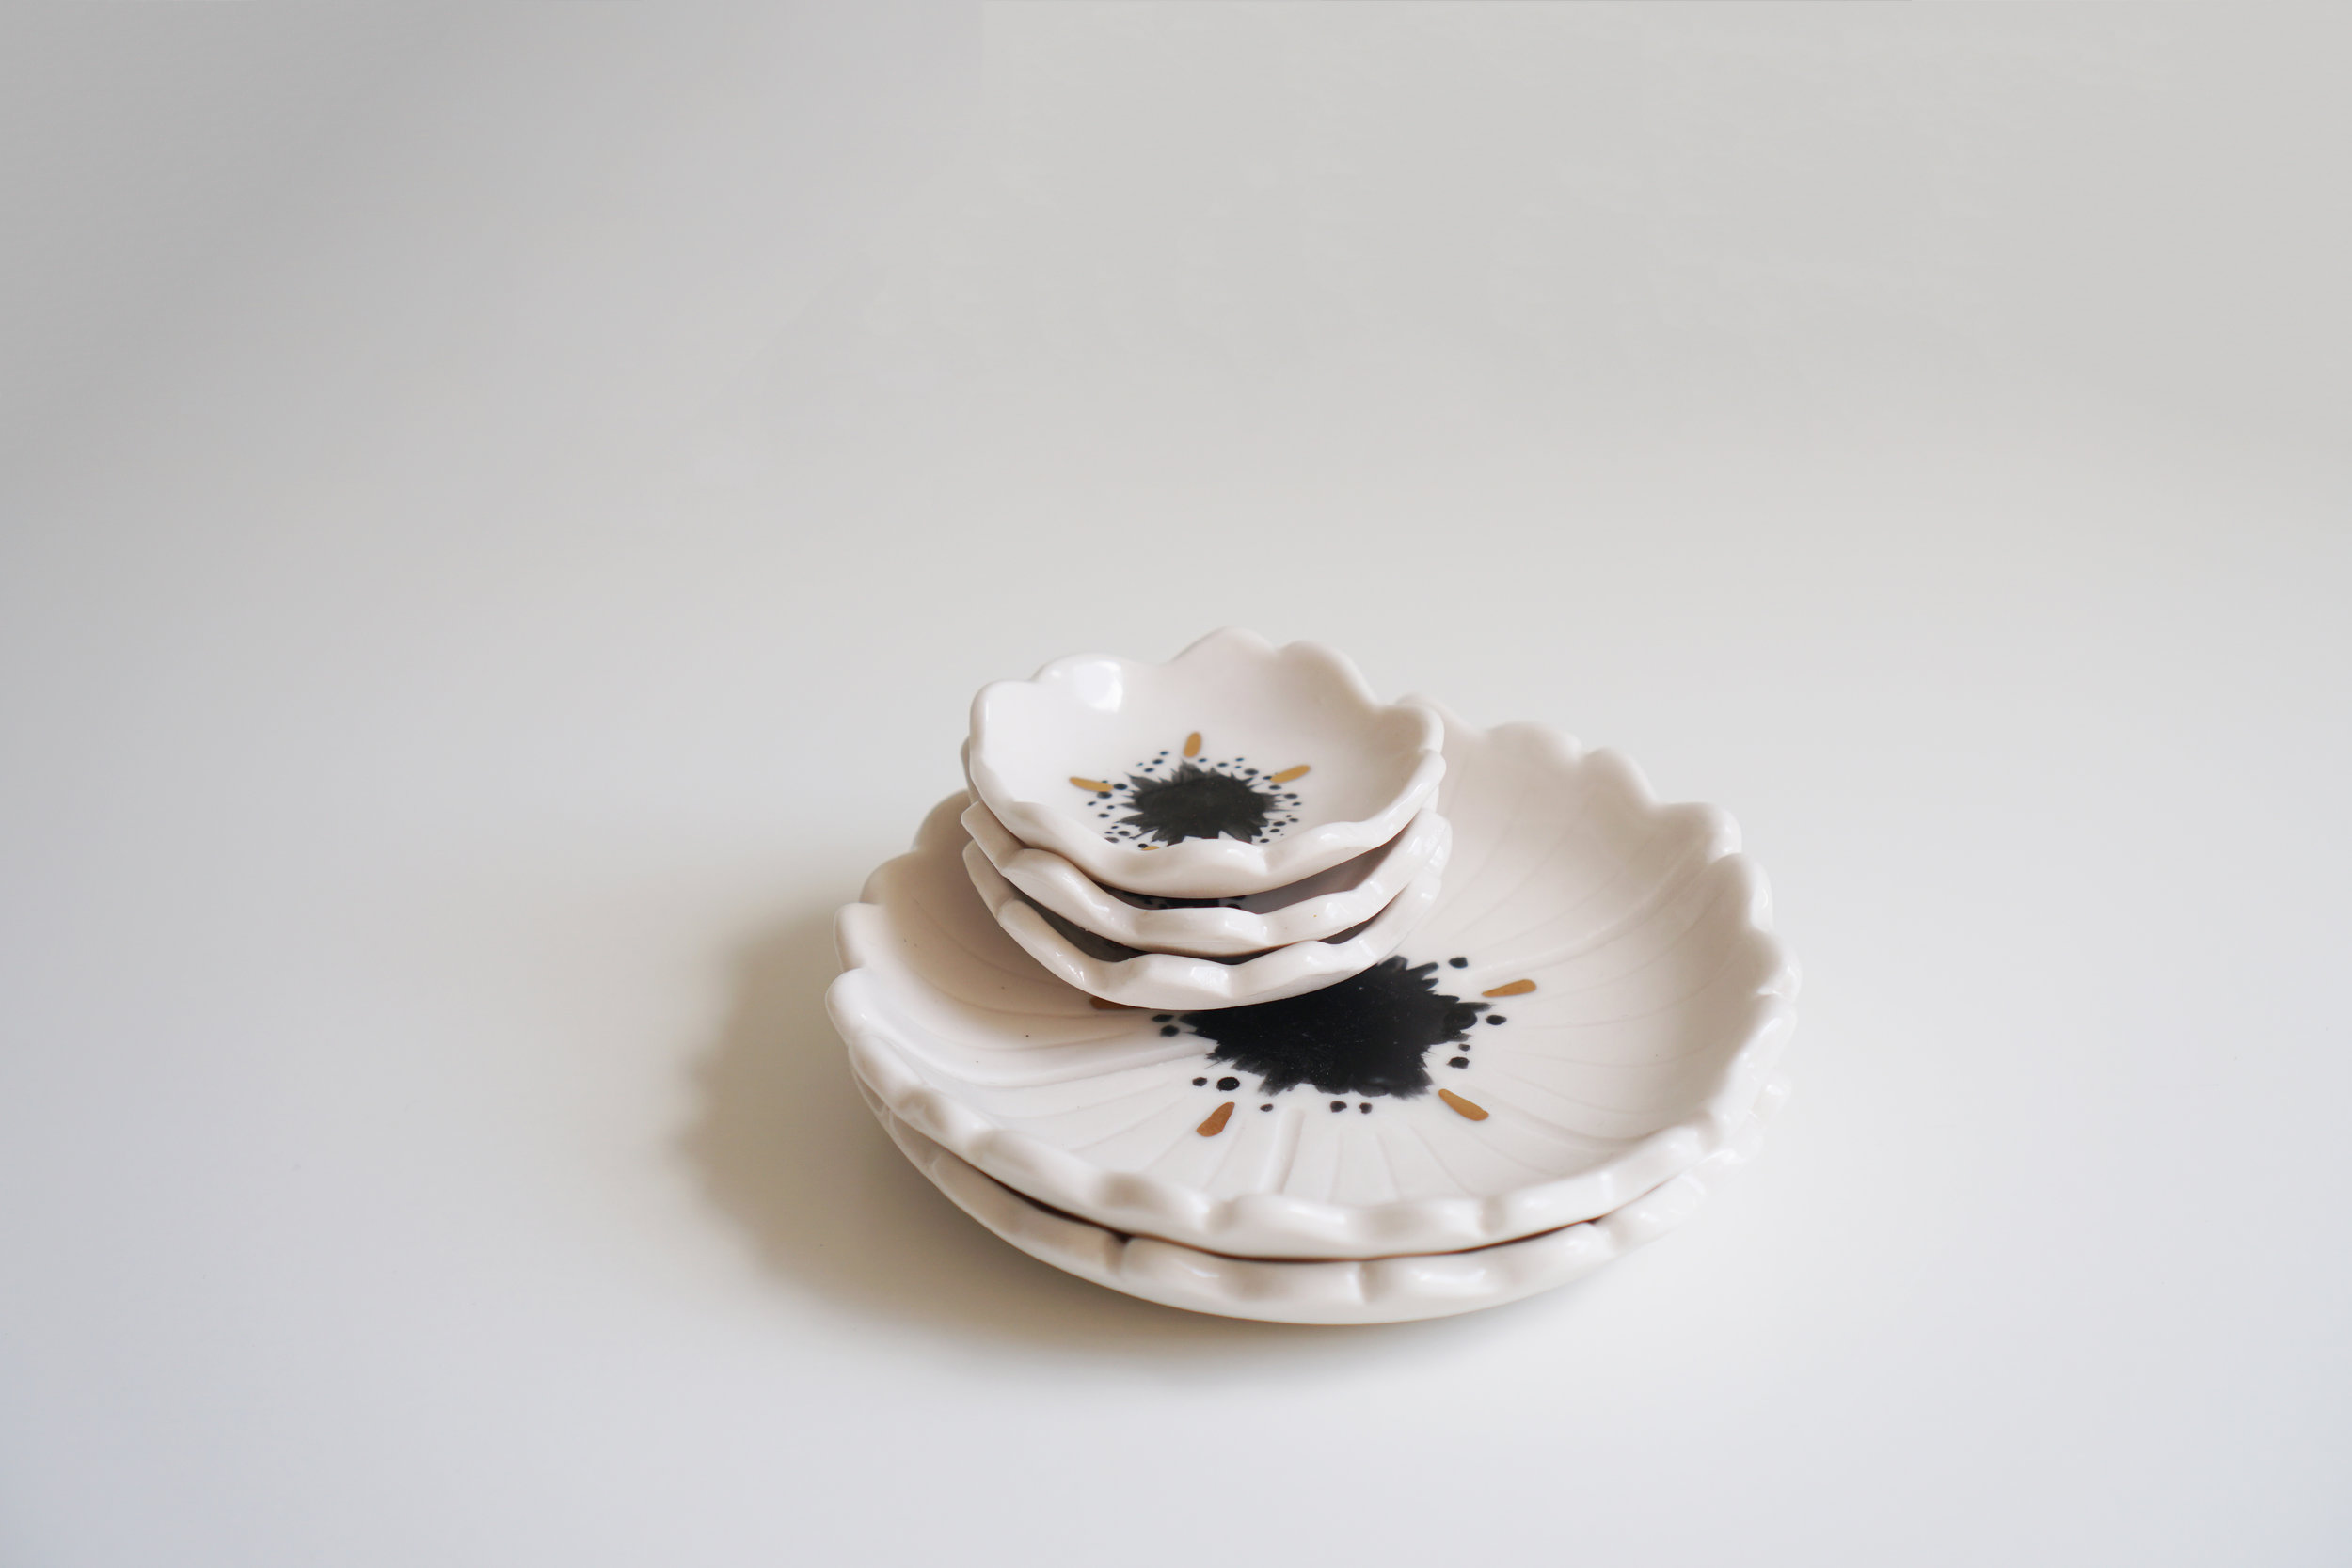 Photo courtesy of Garden Study Ceramics